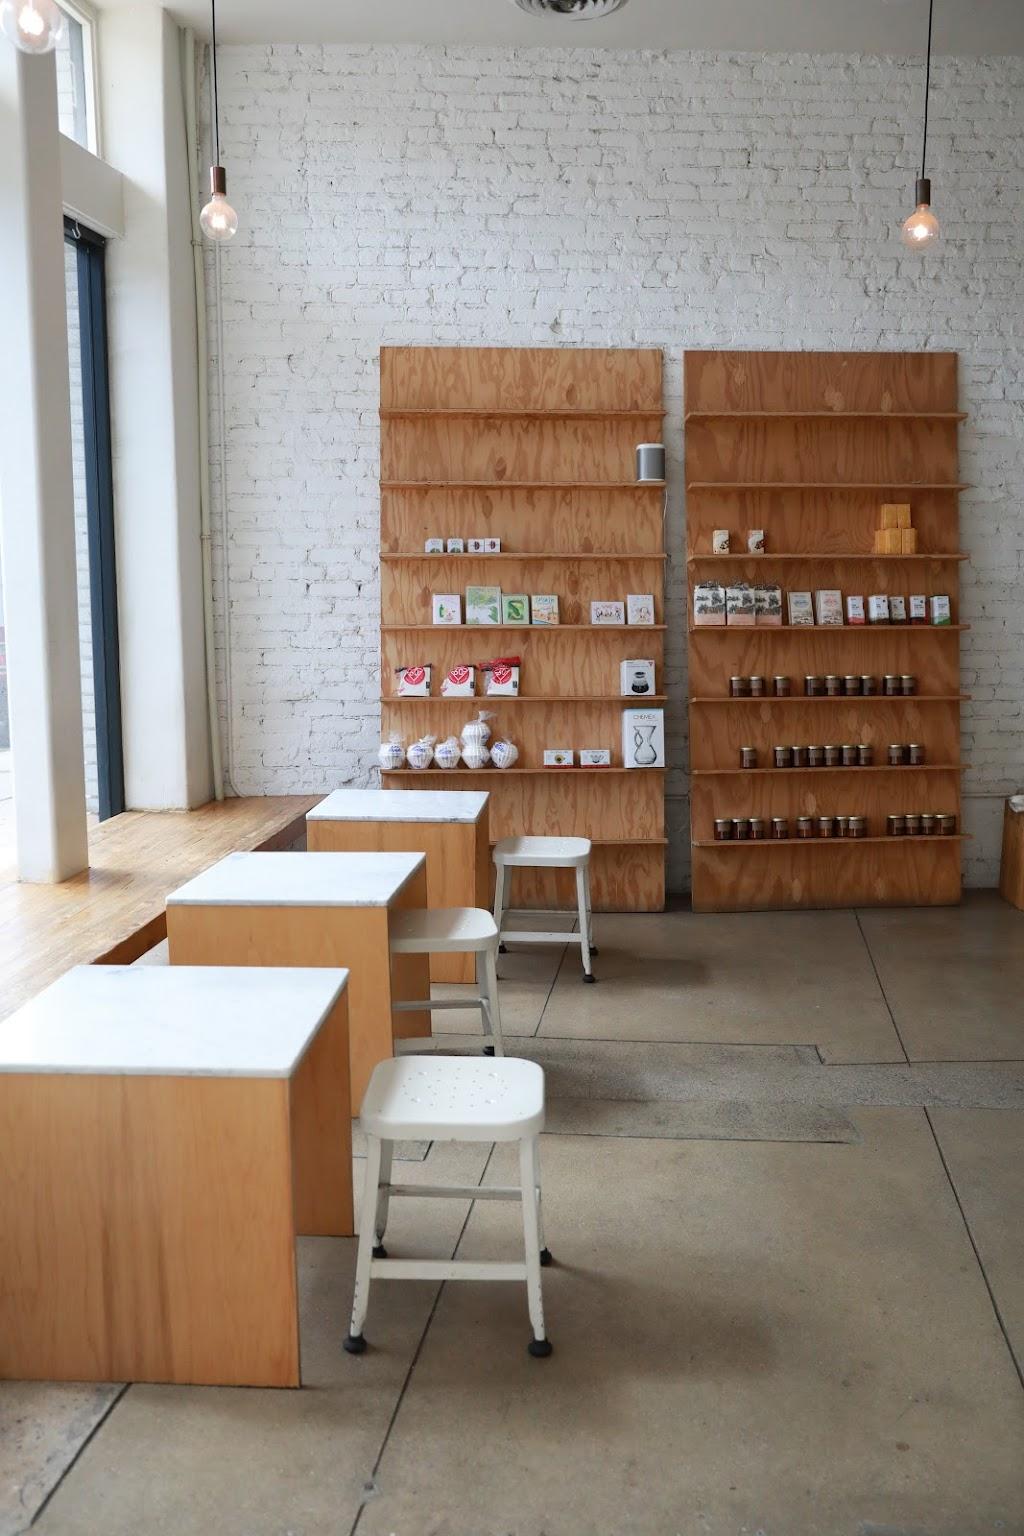 Eightfold Coffee - cafe  | Photo 6 of 10 | Address: 1294 Sunset Blvd, Los Angeles, CA 90026, USA | Phone: (213) 947-3500